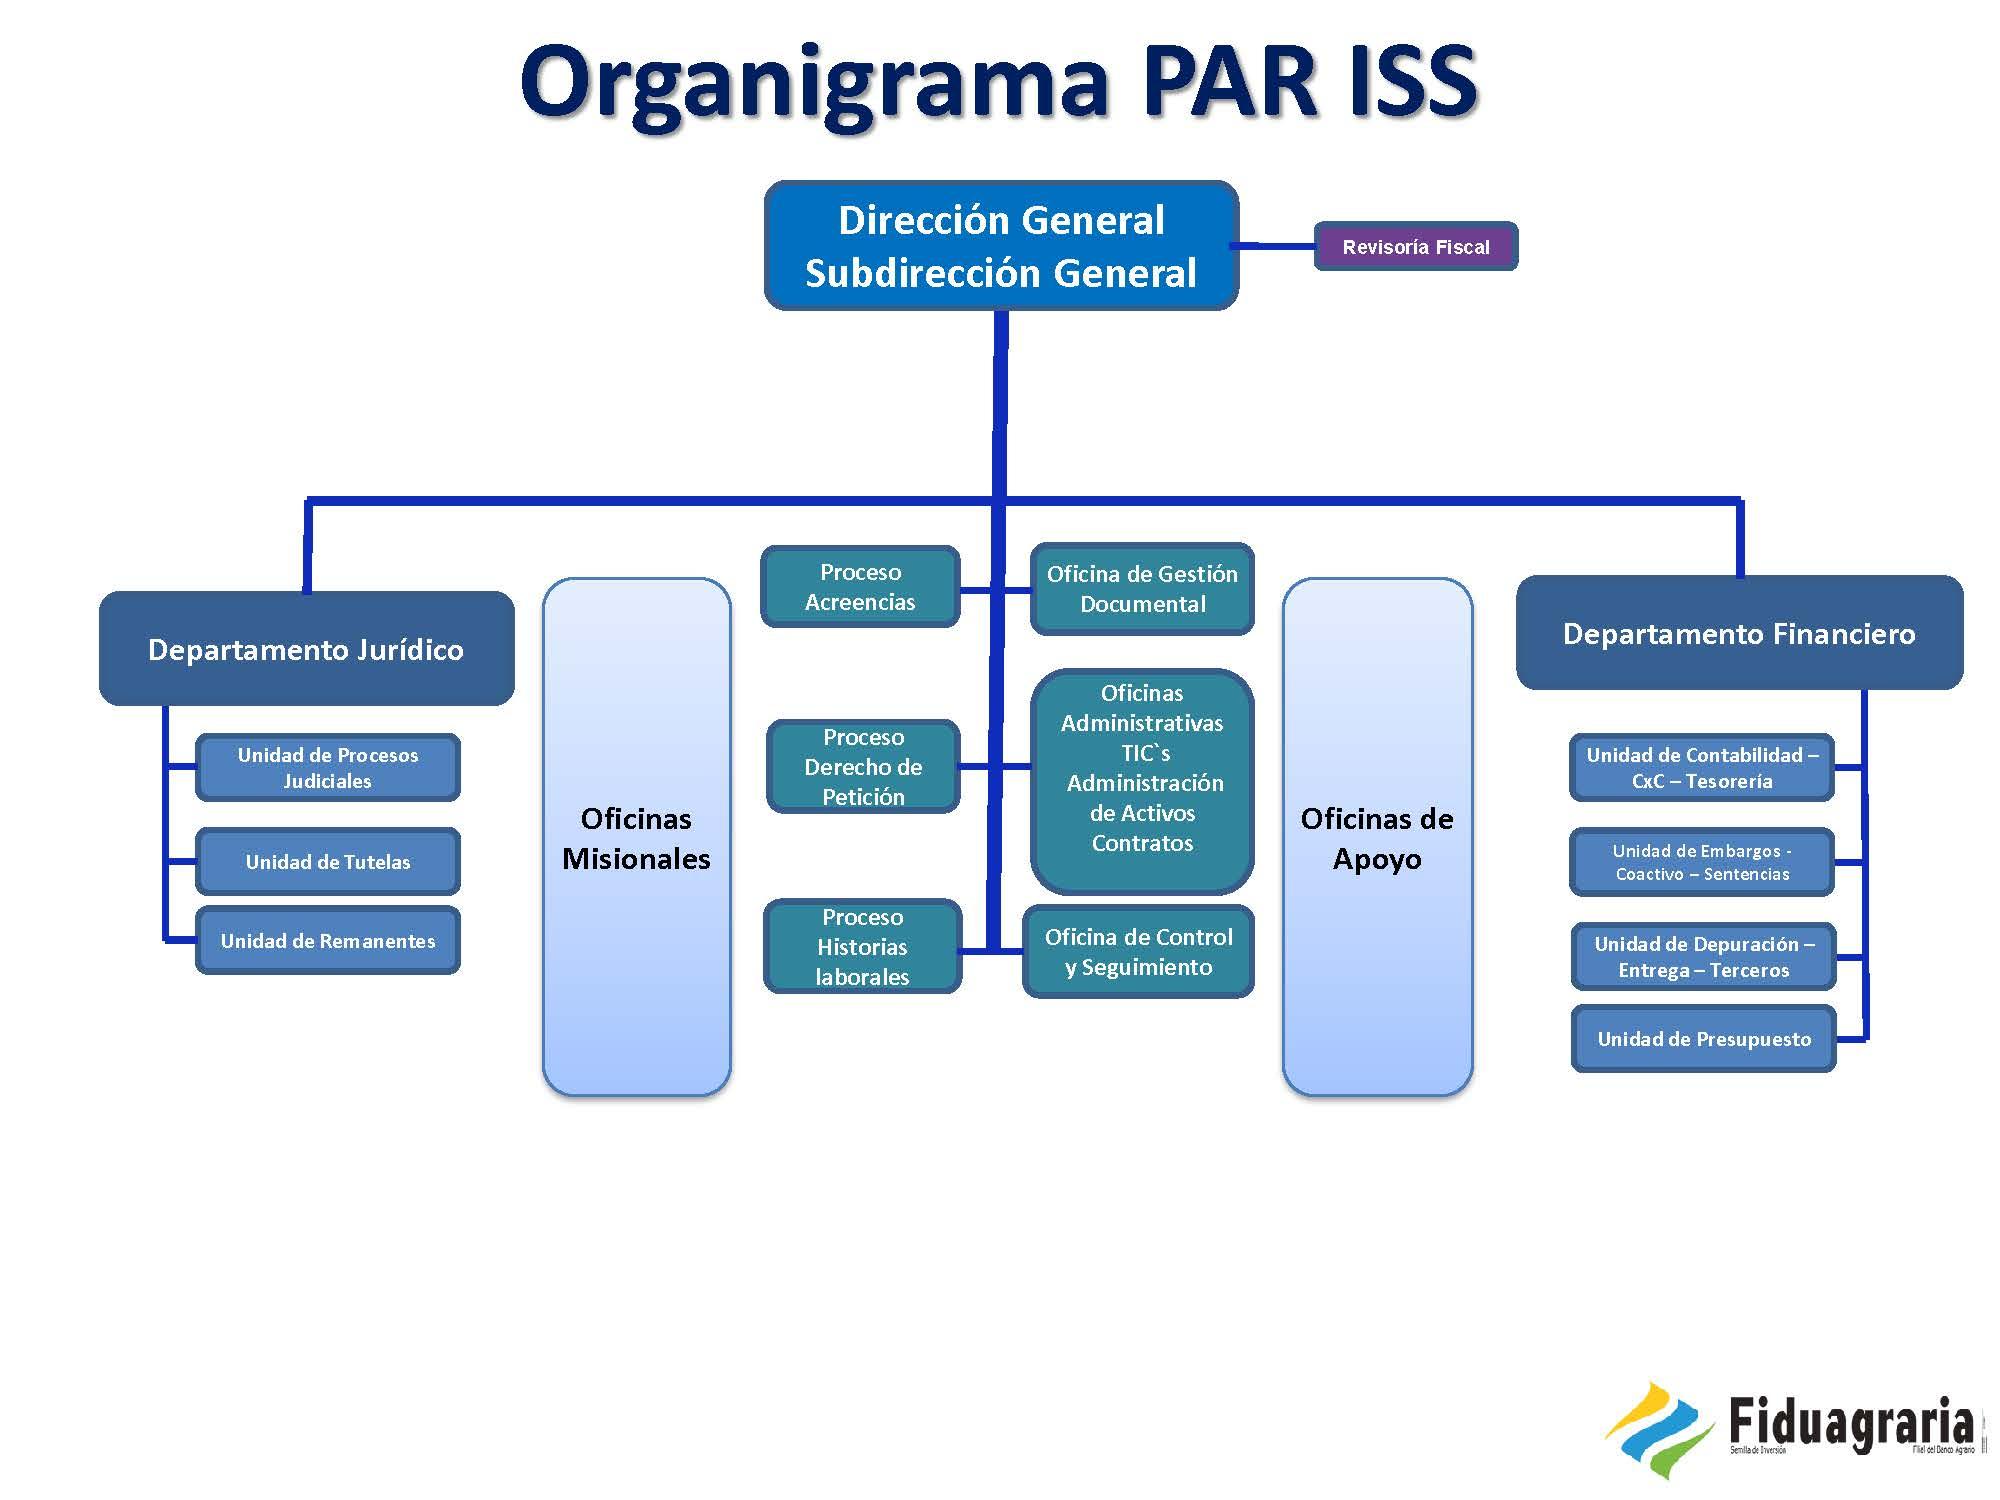 Organigrama P.A.R.I.S.S